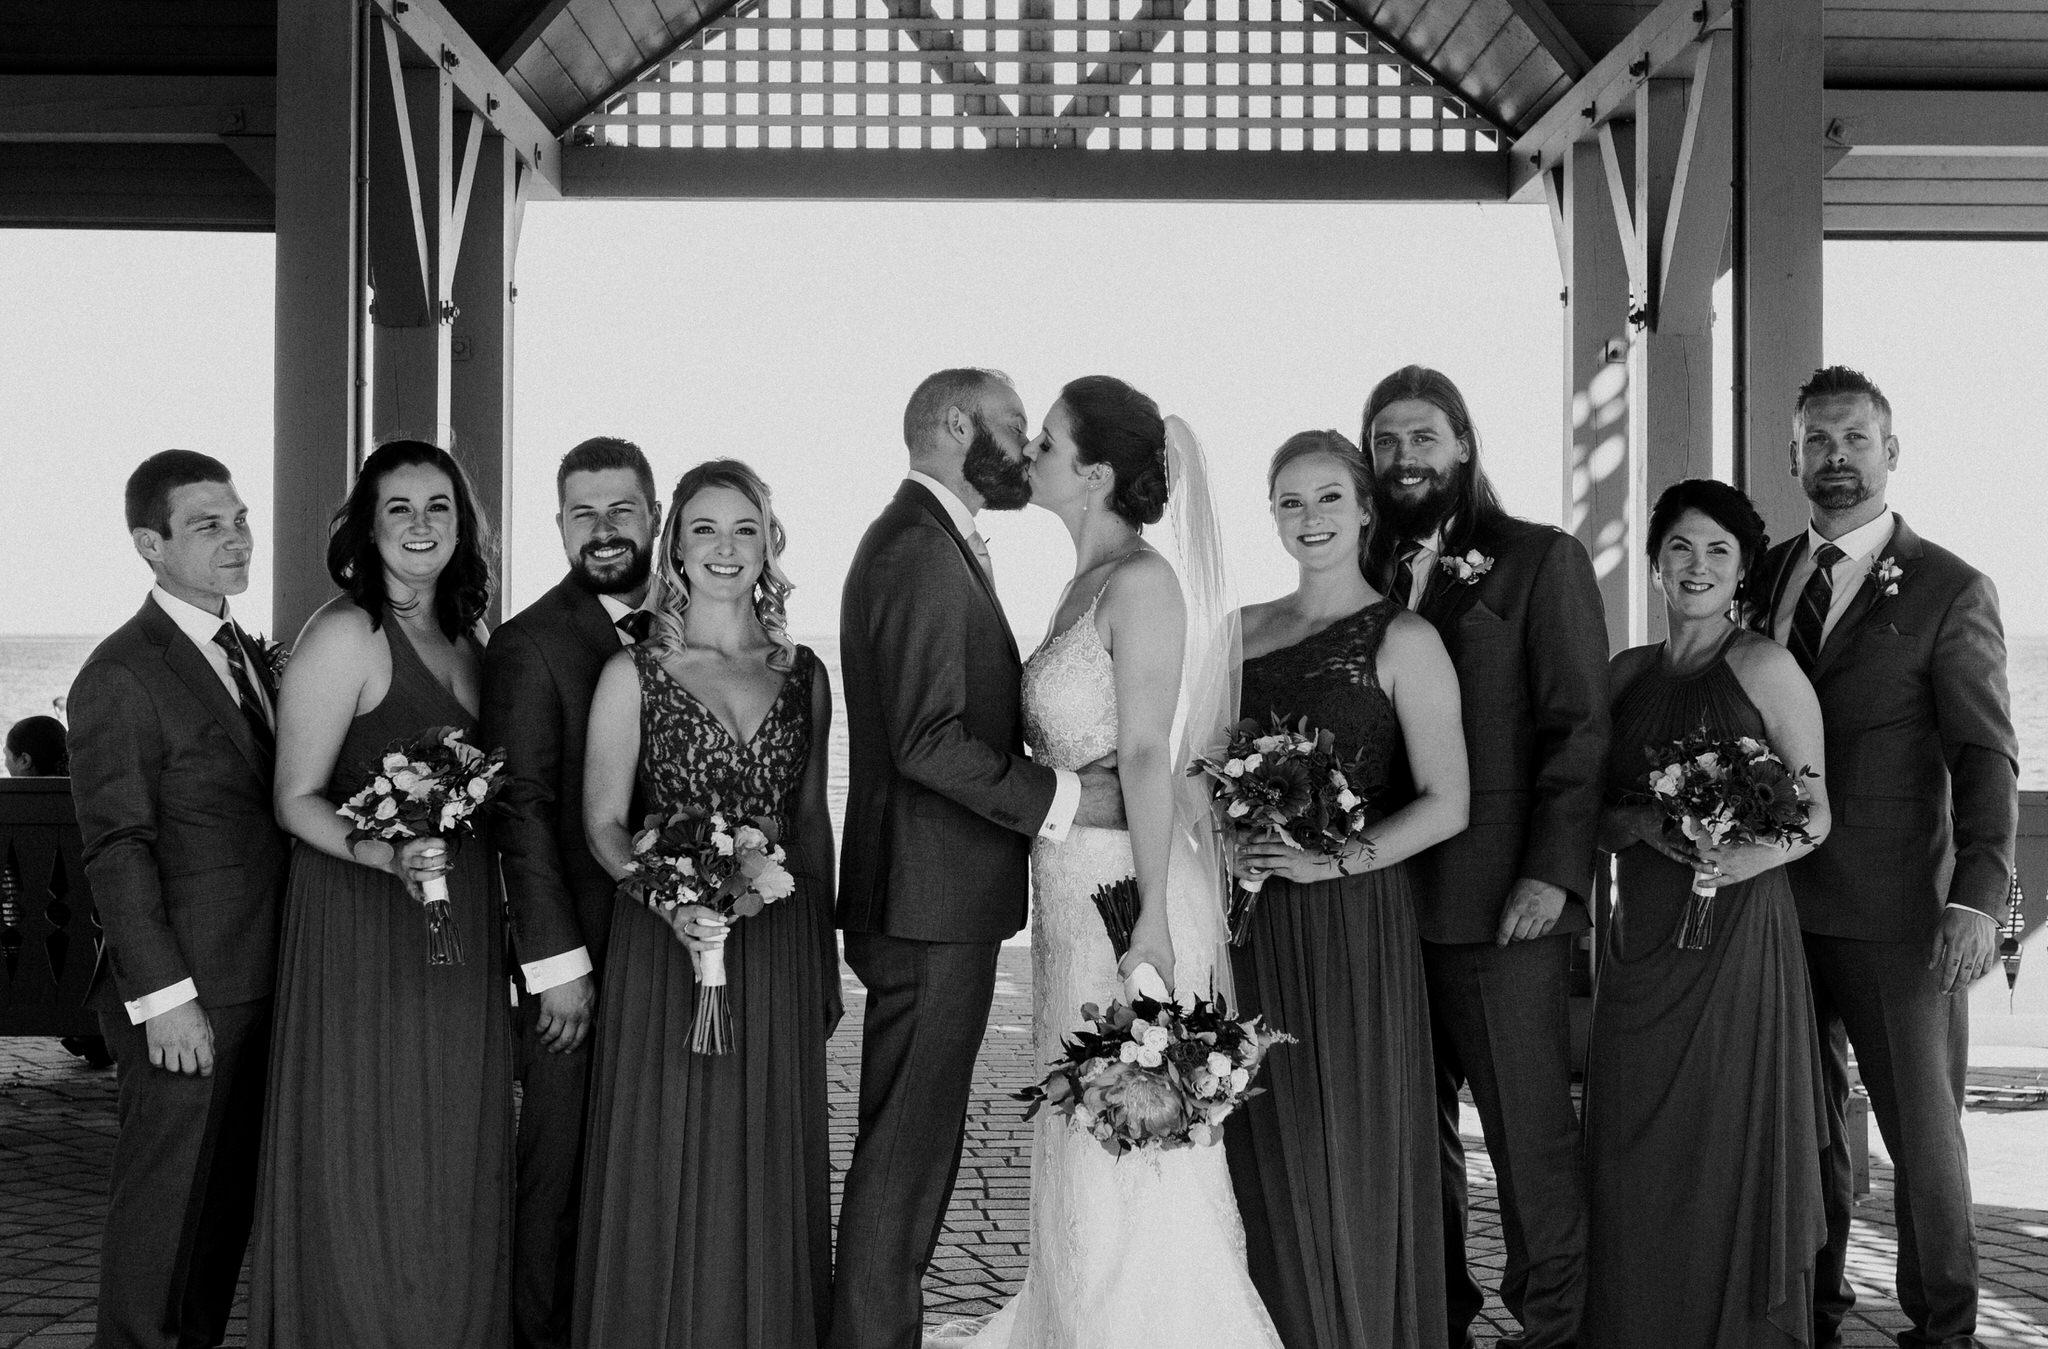 Brock Street Brewery Wedding - wedding party portrait